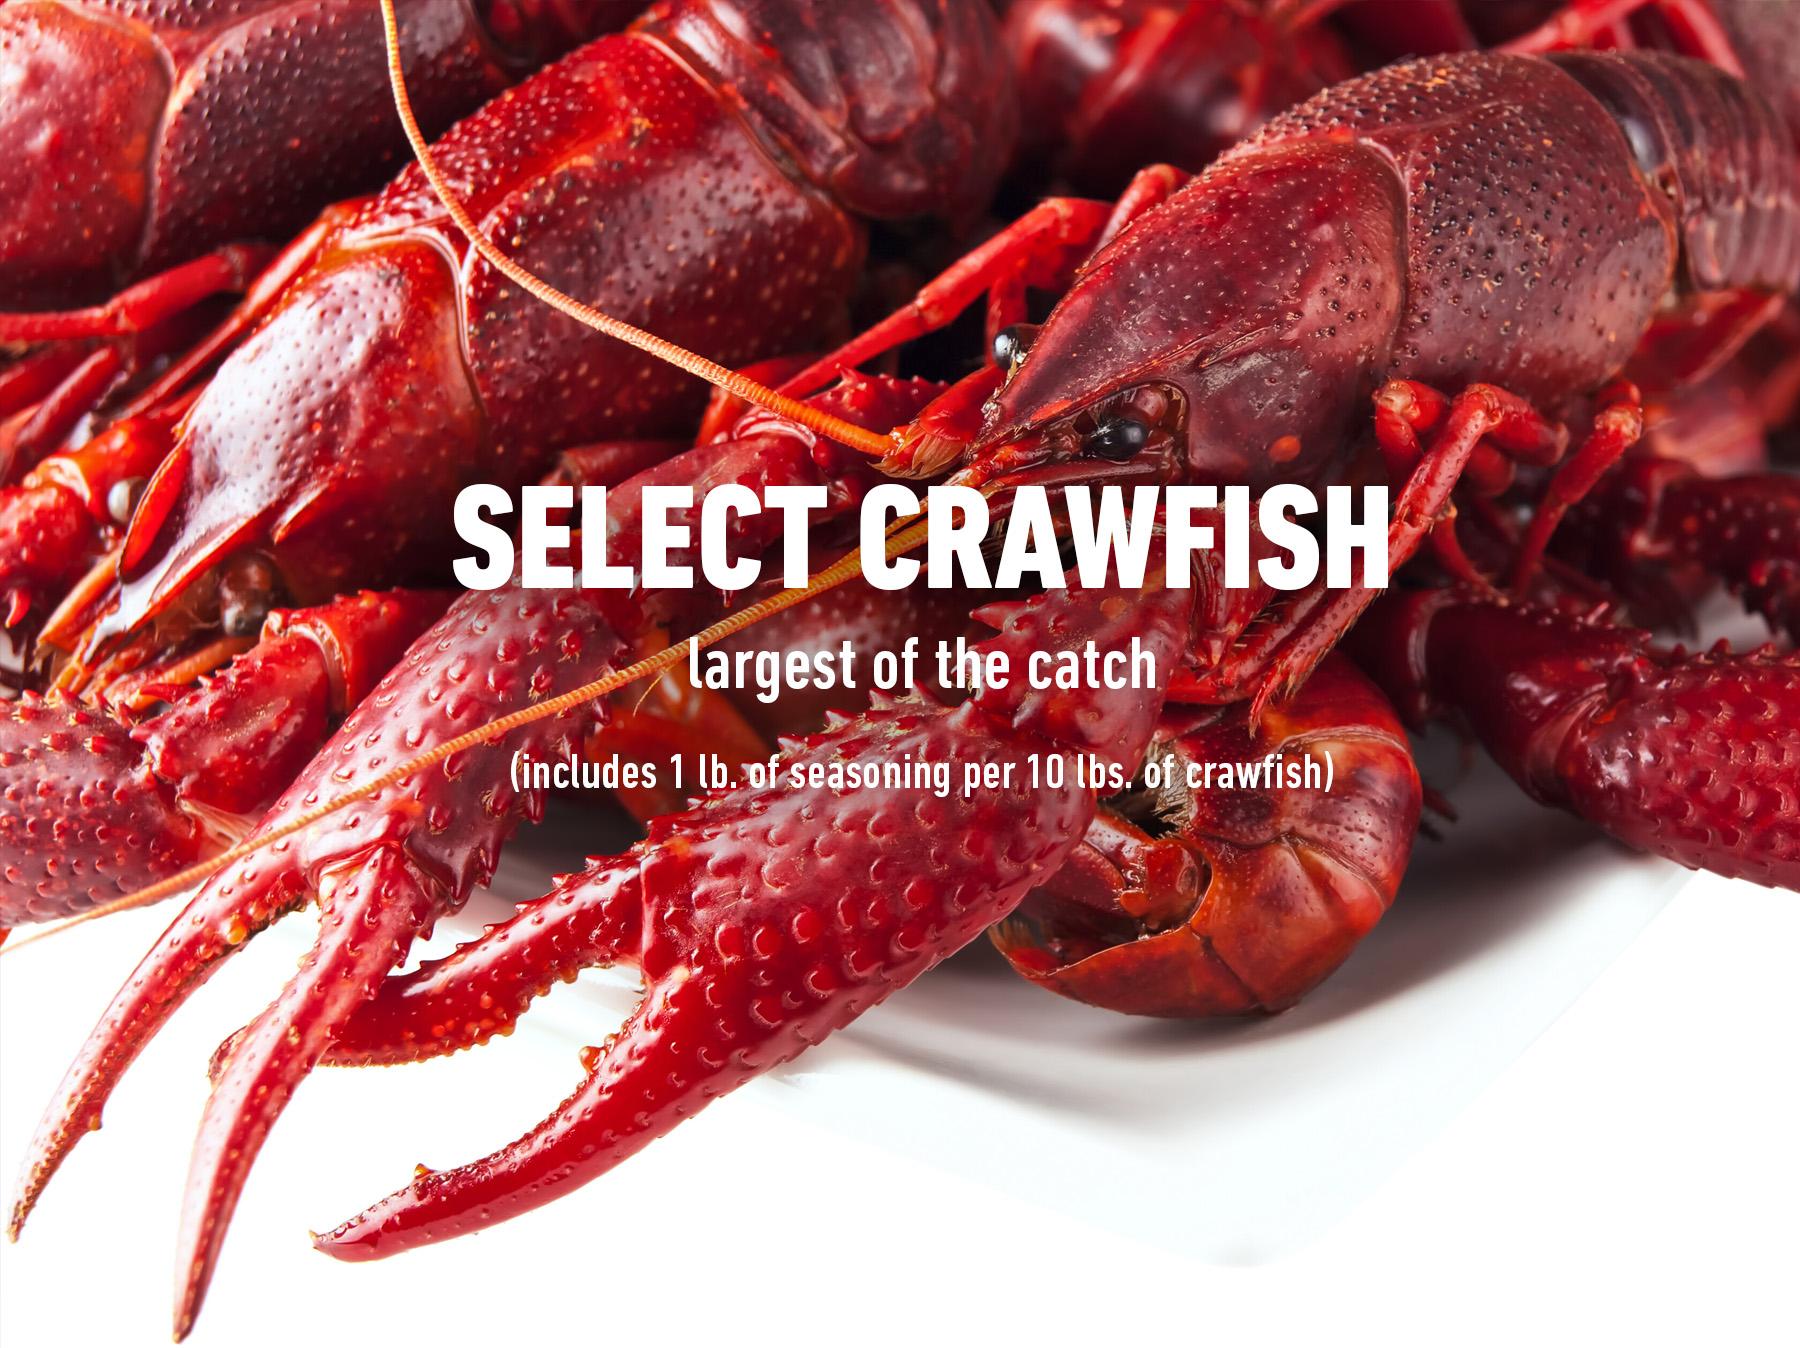 Select Crawfish